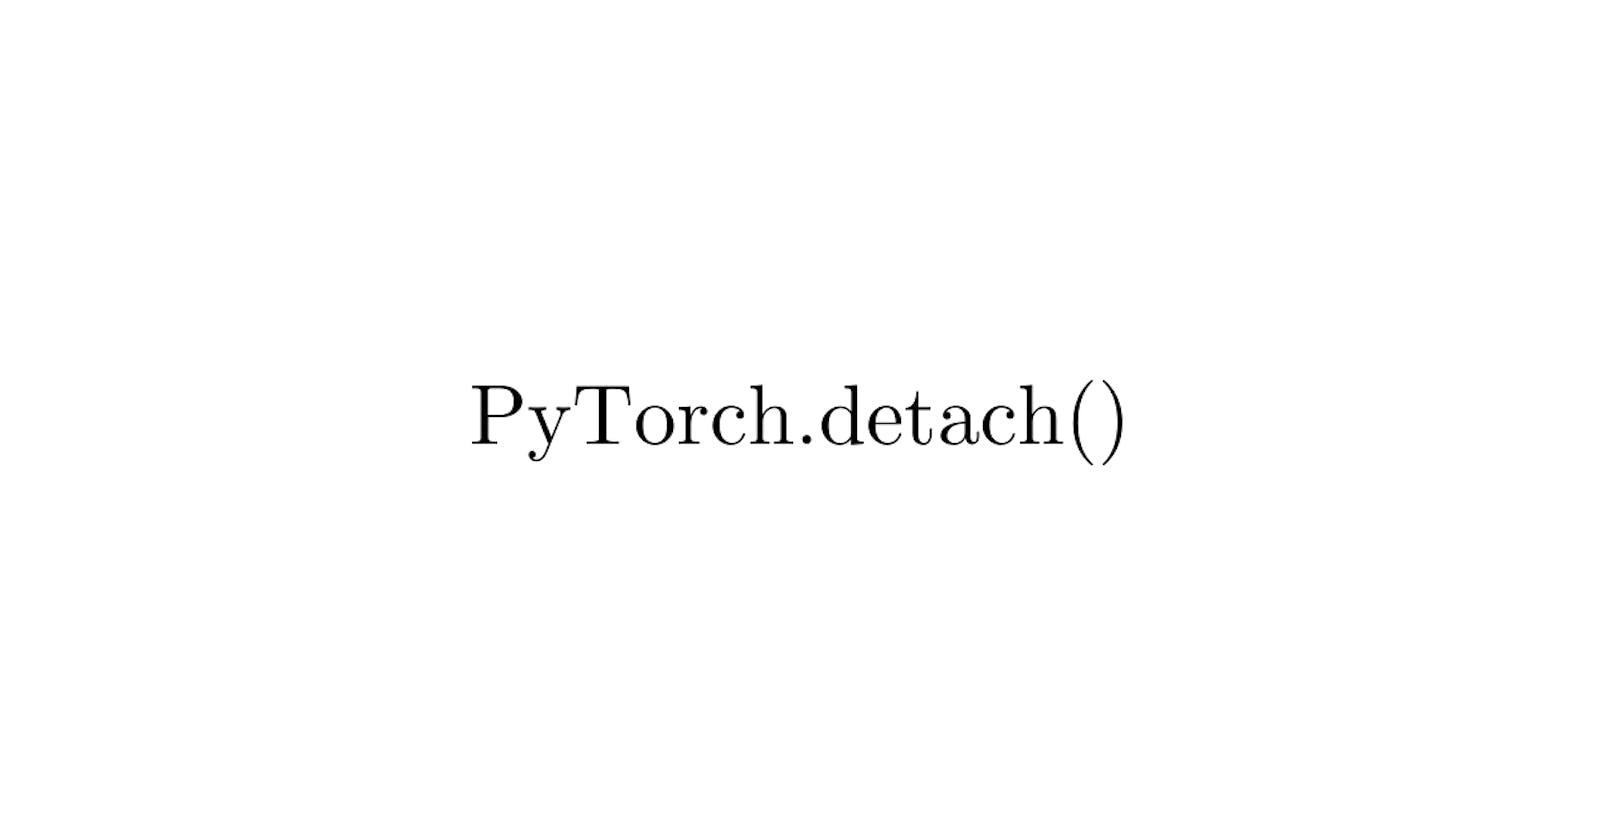 What is PyTorch .detach() method?